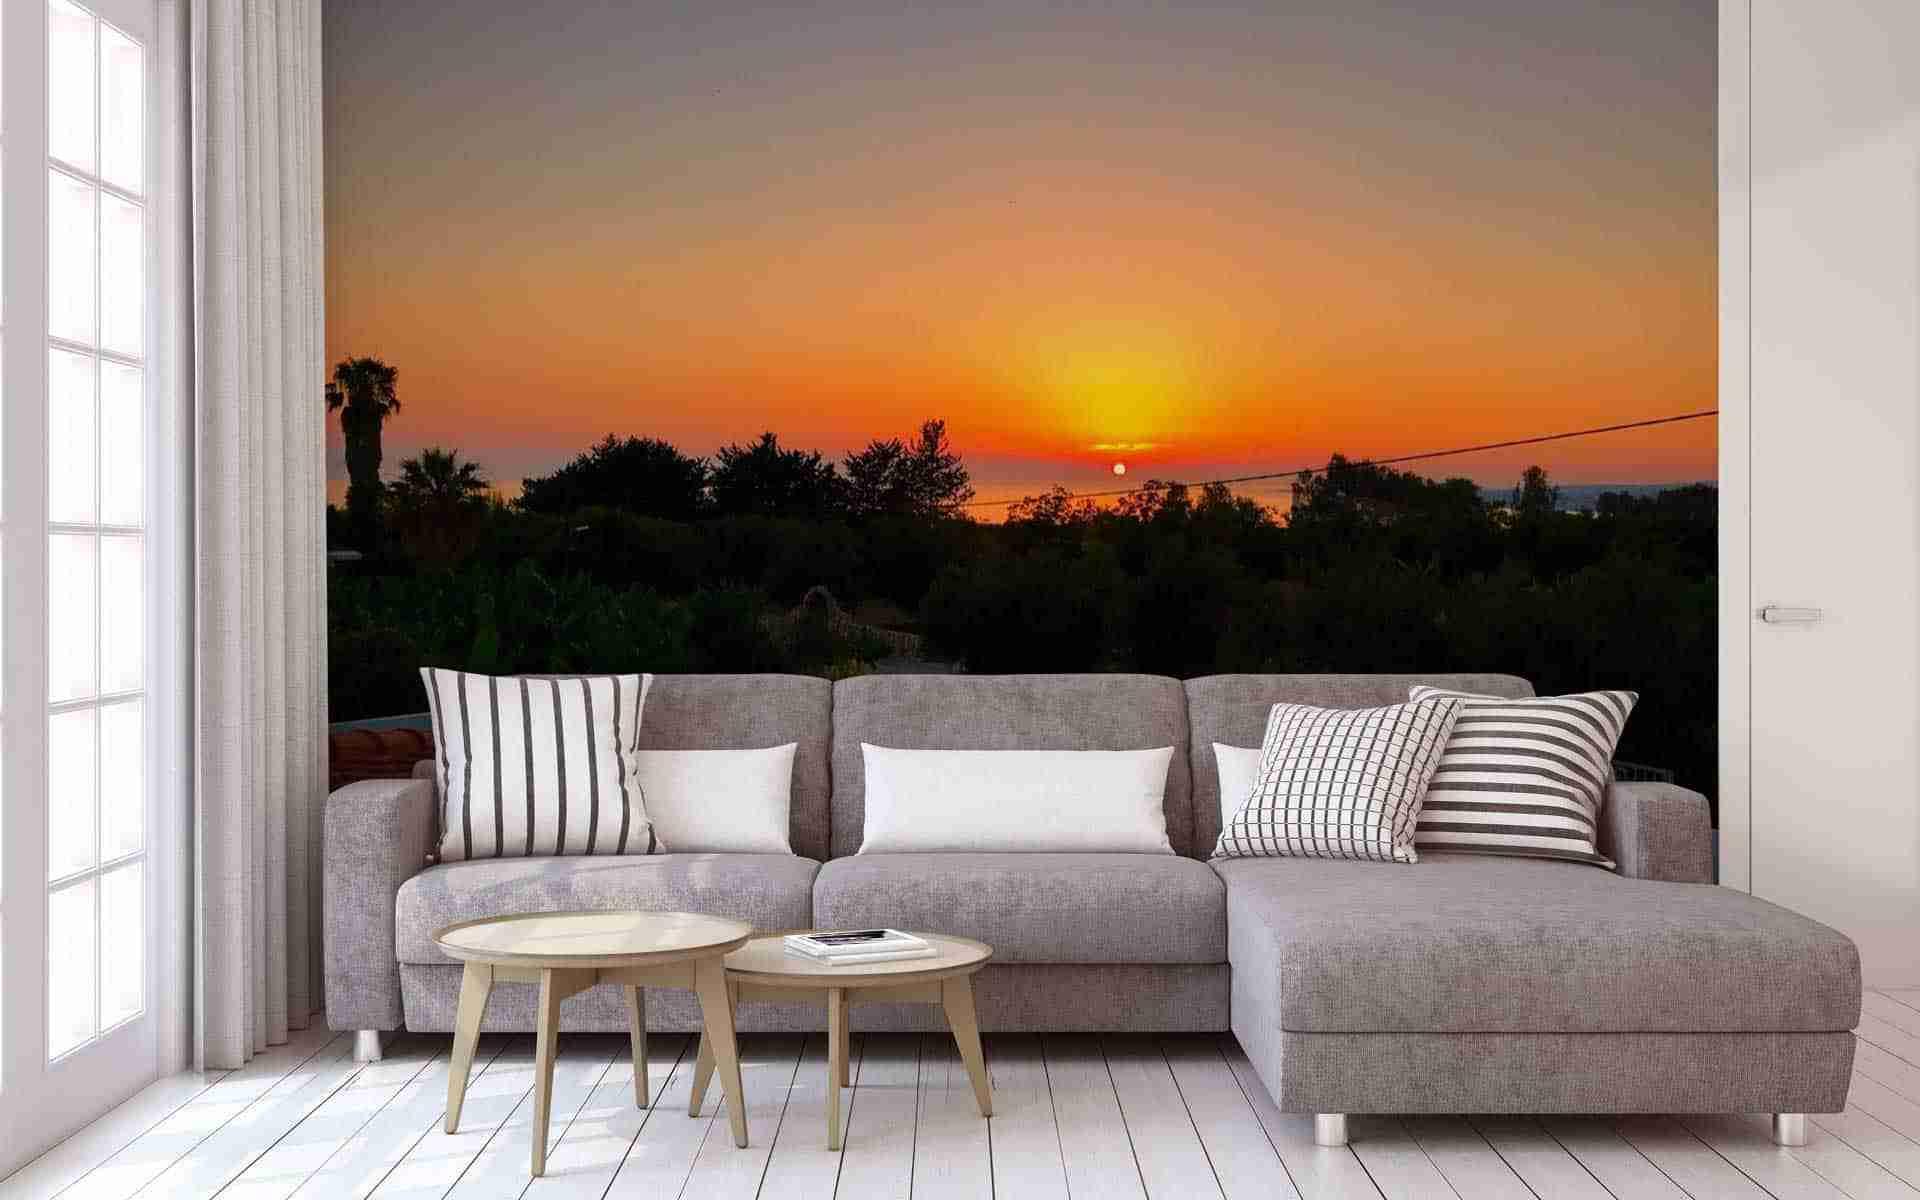 cyprus-sunset-wall-art-print-getitprinted.com-